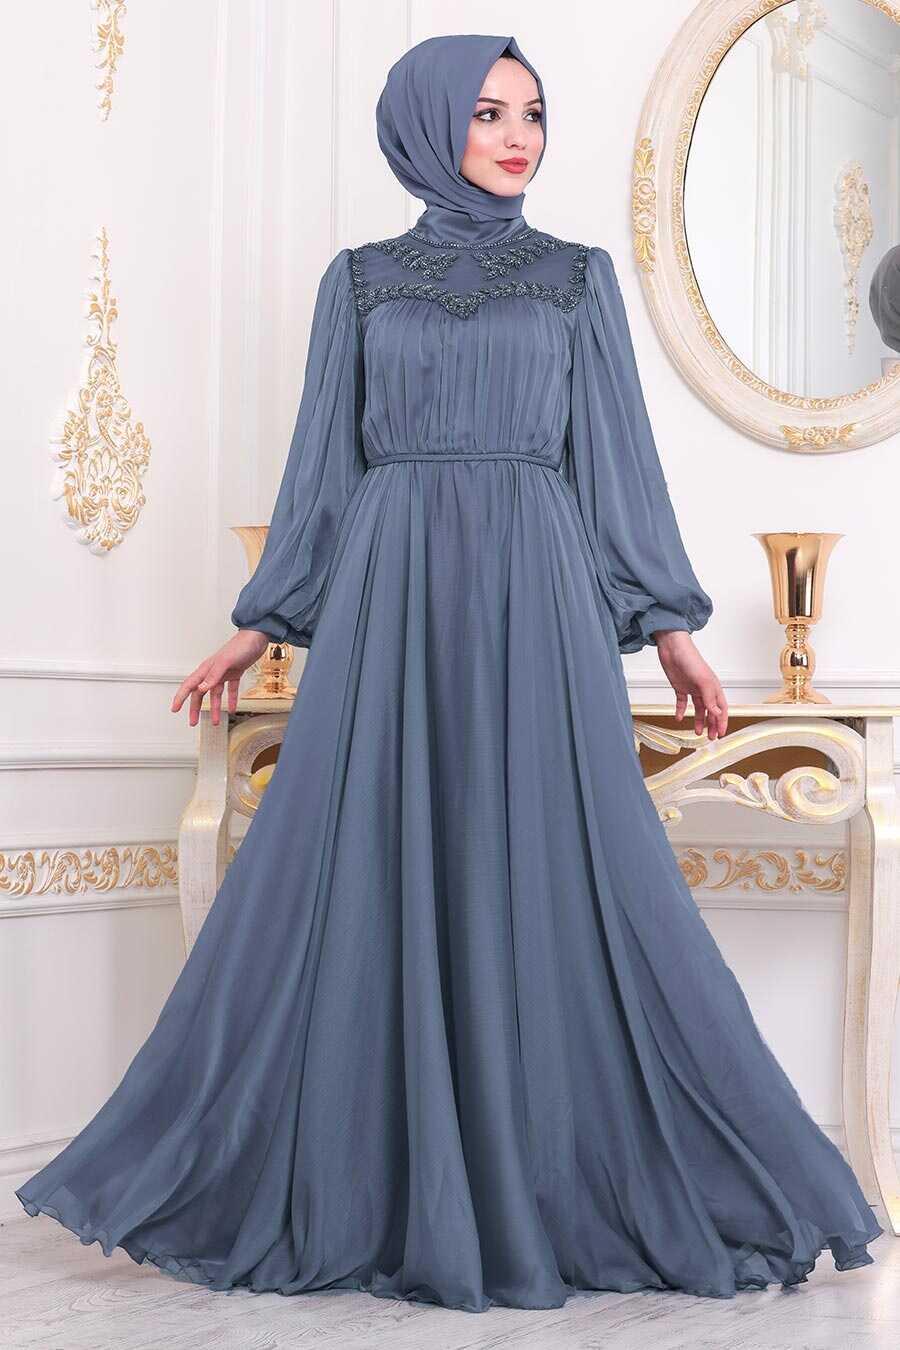 İndigo Blue Hijab Evening Dress 40560IM